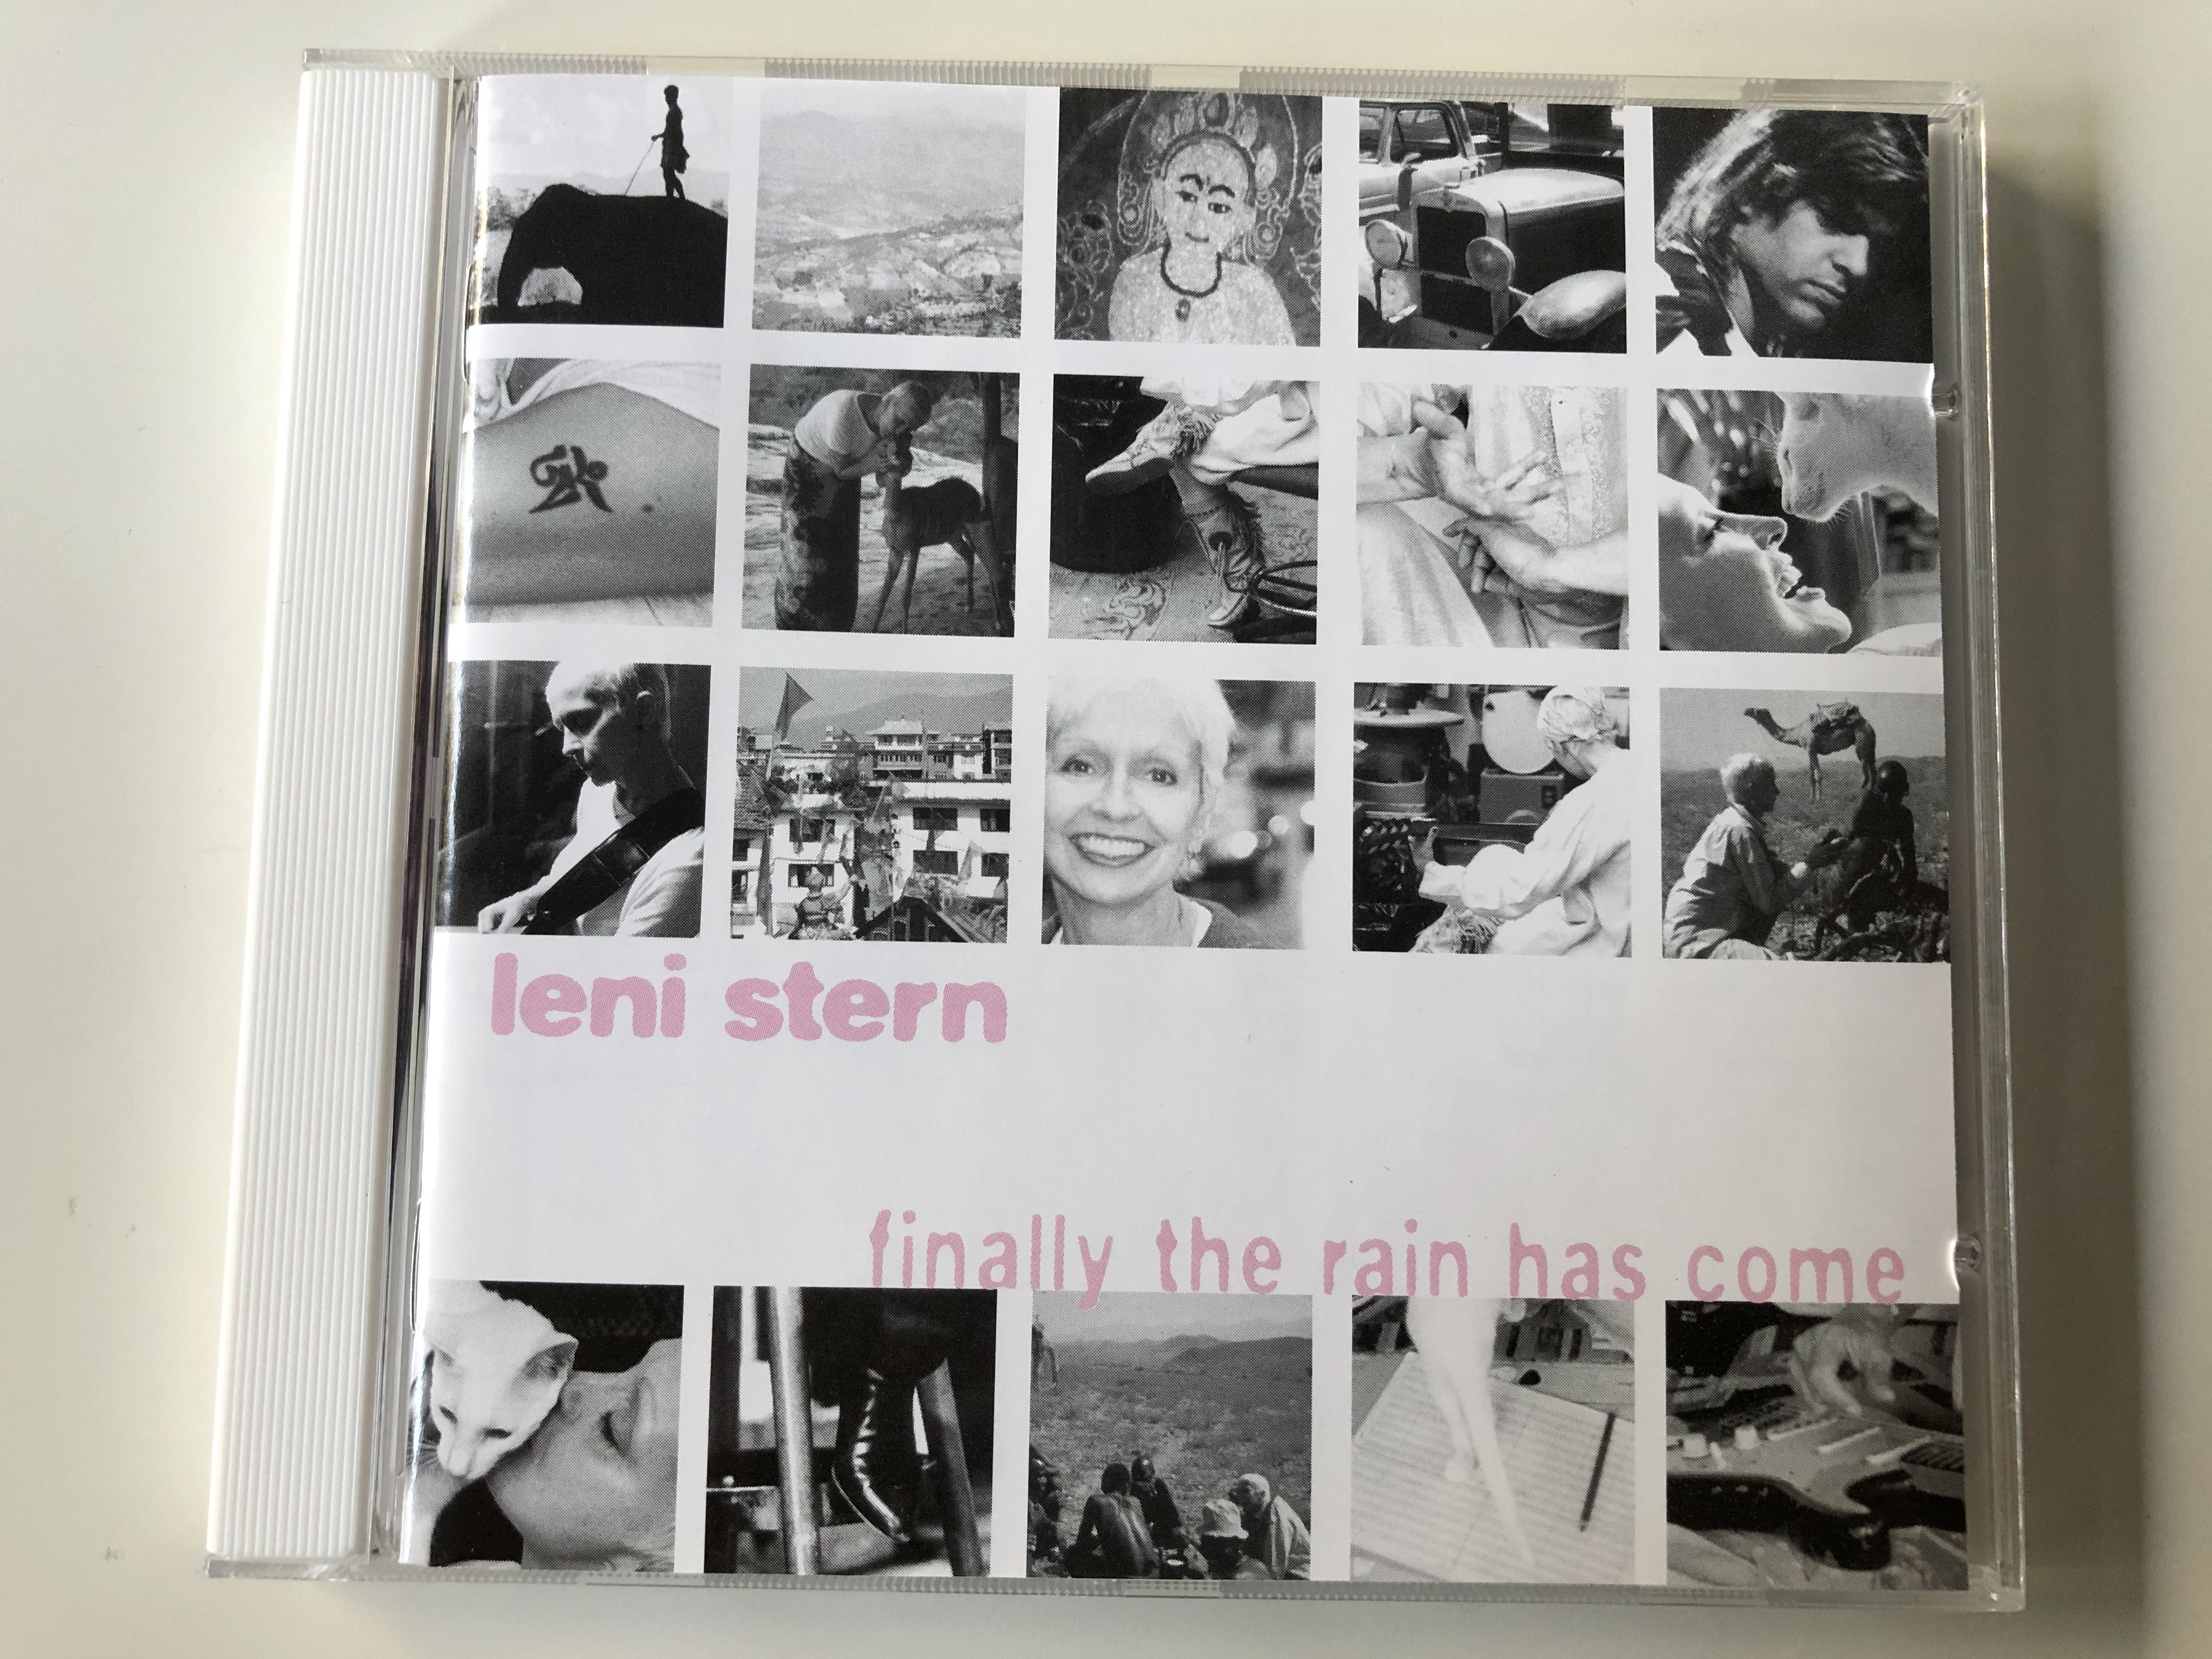 leni-stern-finally-the-rain-has-come-metalimbo-records-audio-cd-2003-efa-cd-06364-2-1-.jpg